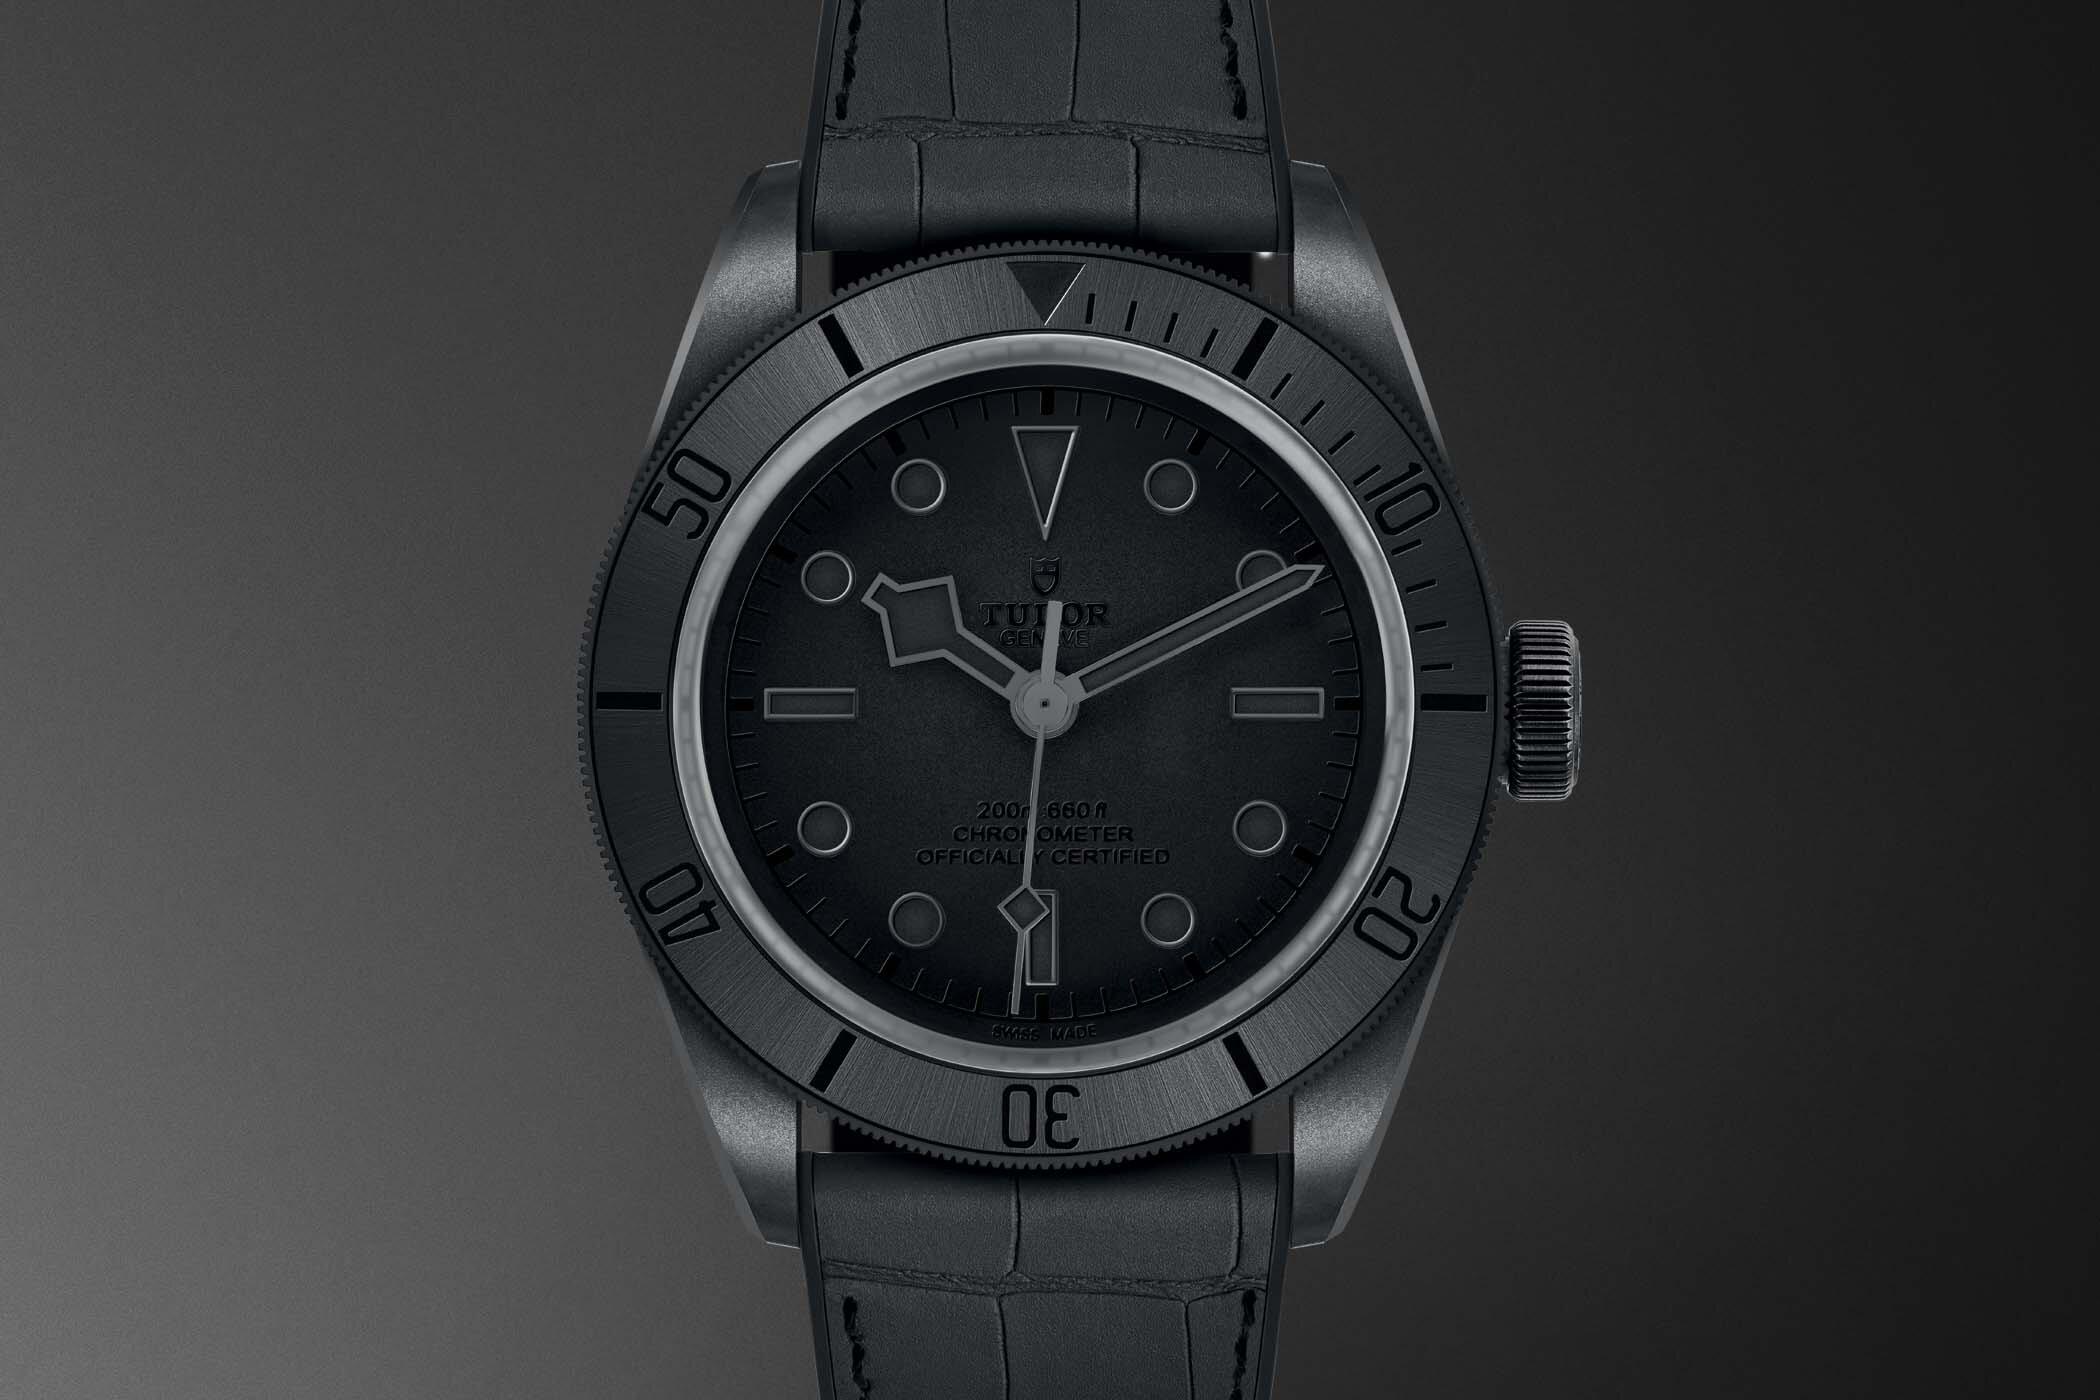 Only-Watch-2019-Tudor-Black-Bay-Ceramic-One-M7921_001CN-Black-1.jpg